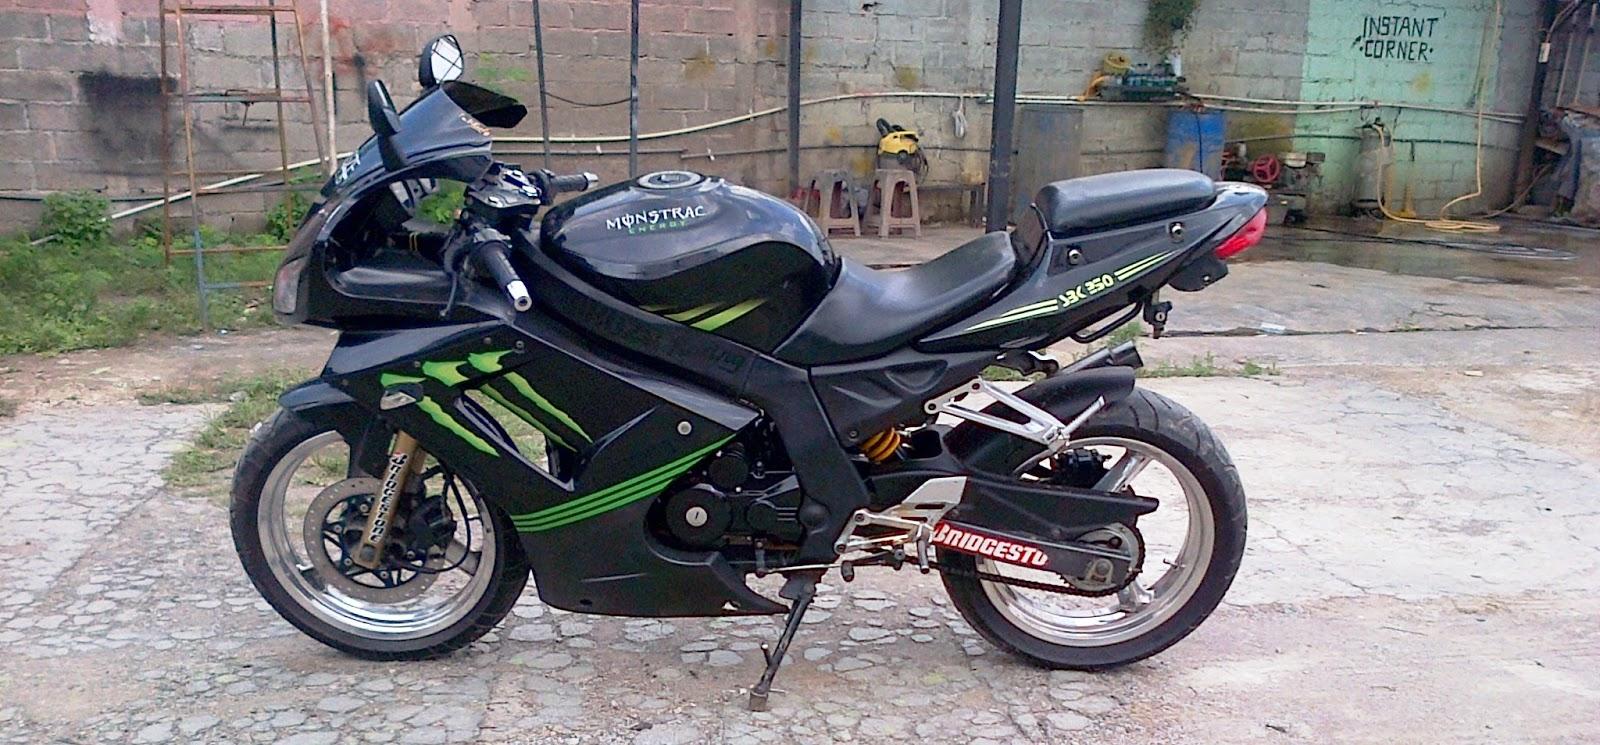 JUAL MOGE SUPERBIKE 250 cc